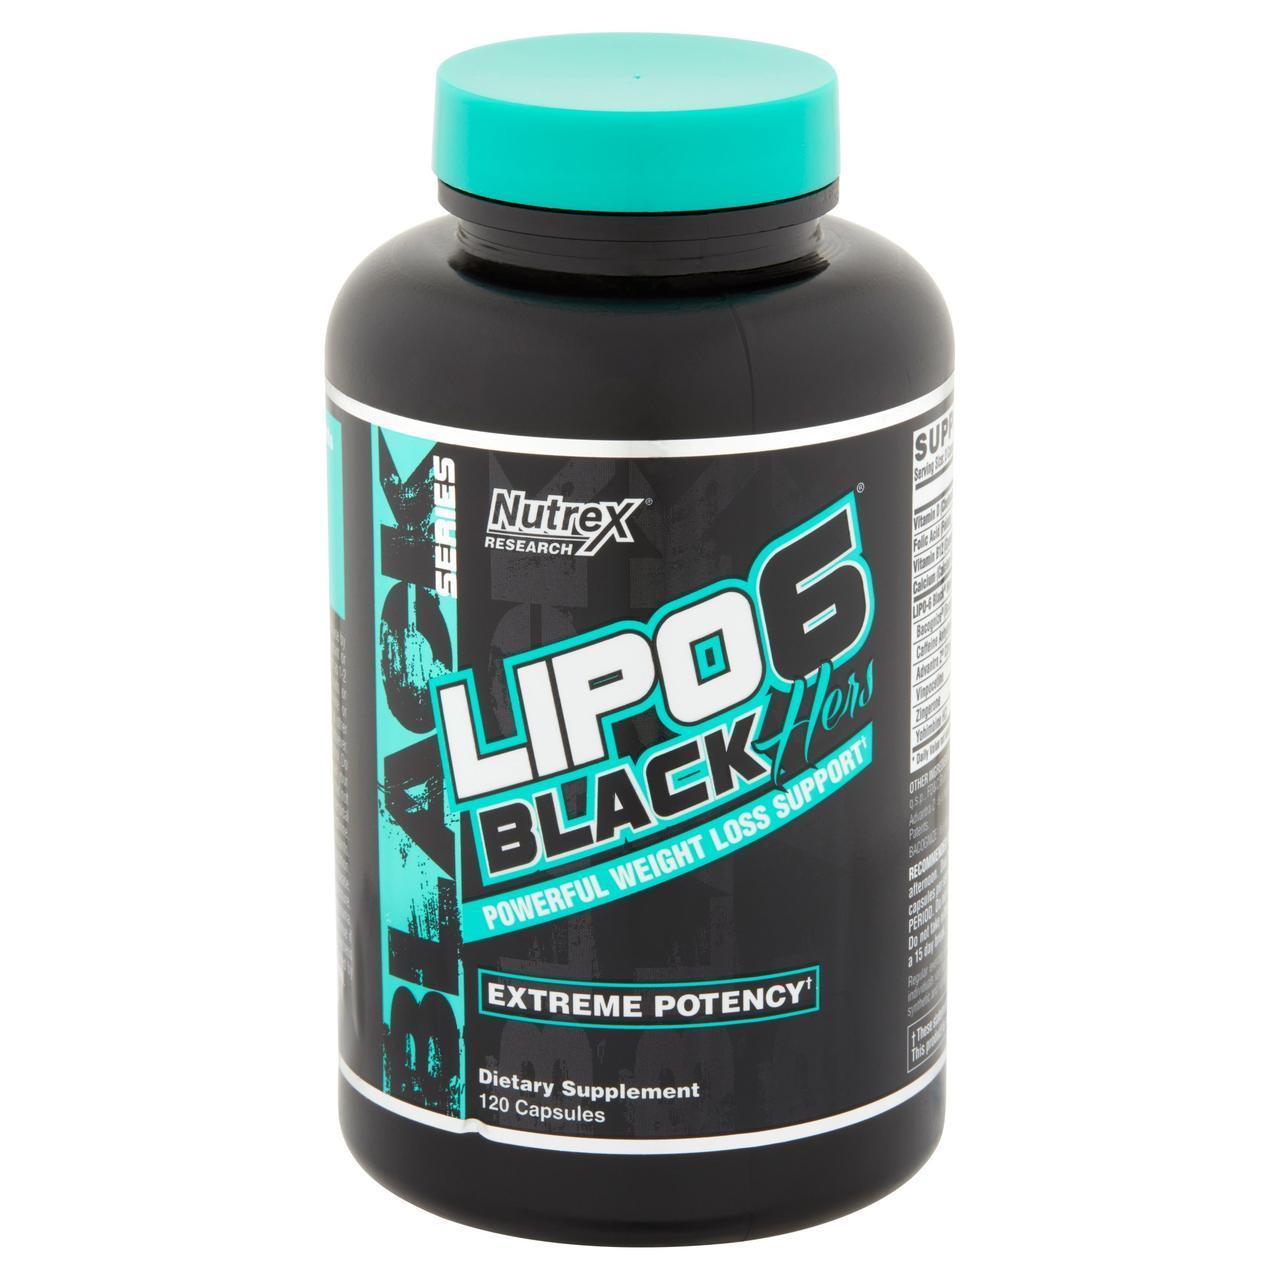 Жиросжигатель Nutrex Lipo 6 Black Hers (120 капс)